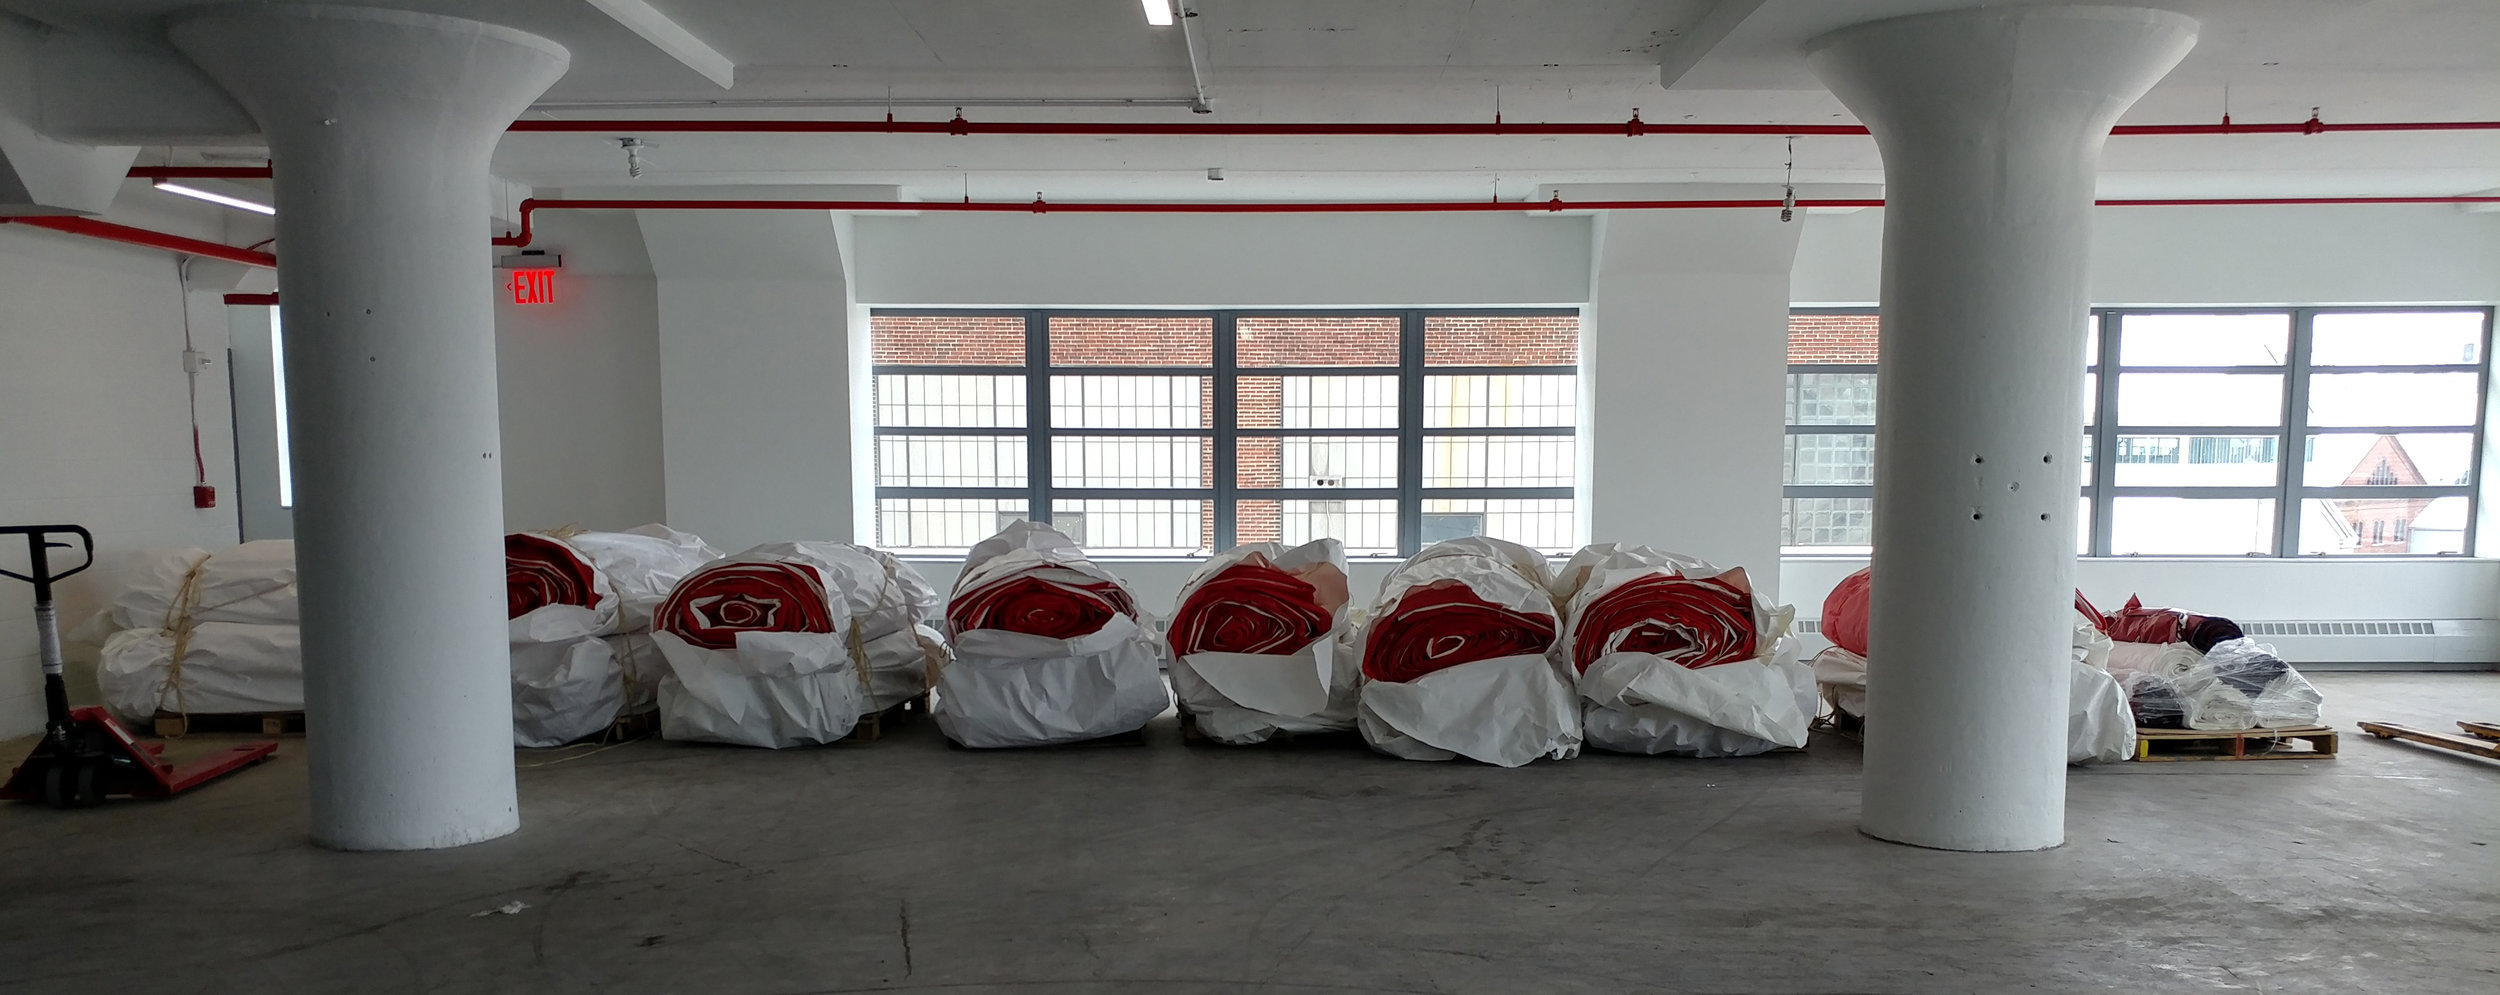 Our team receiving salt tarps on site